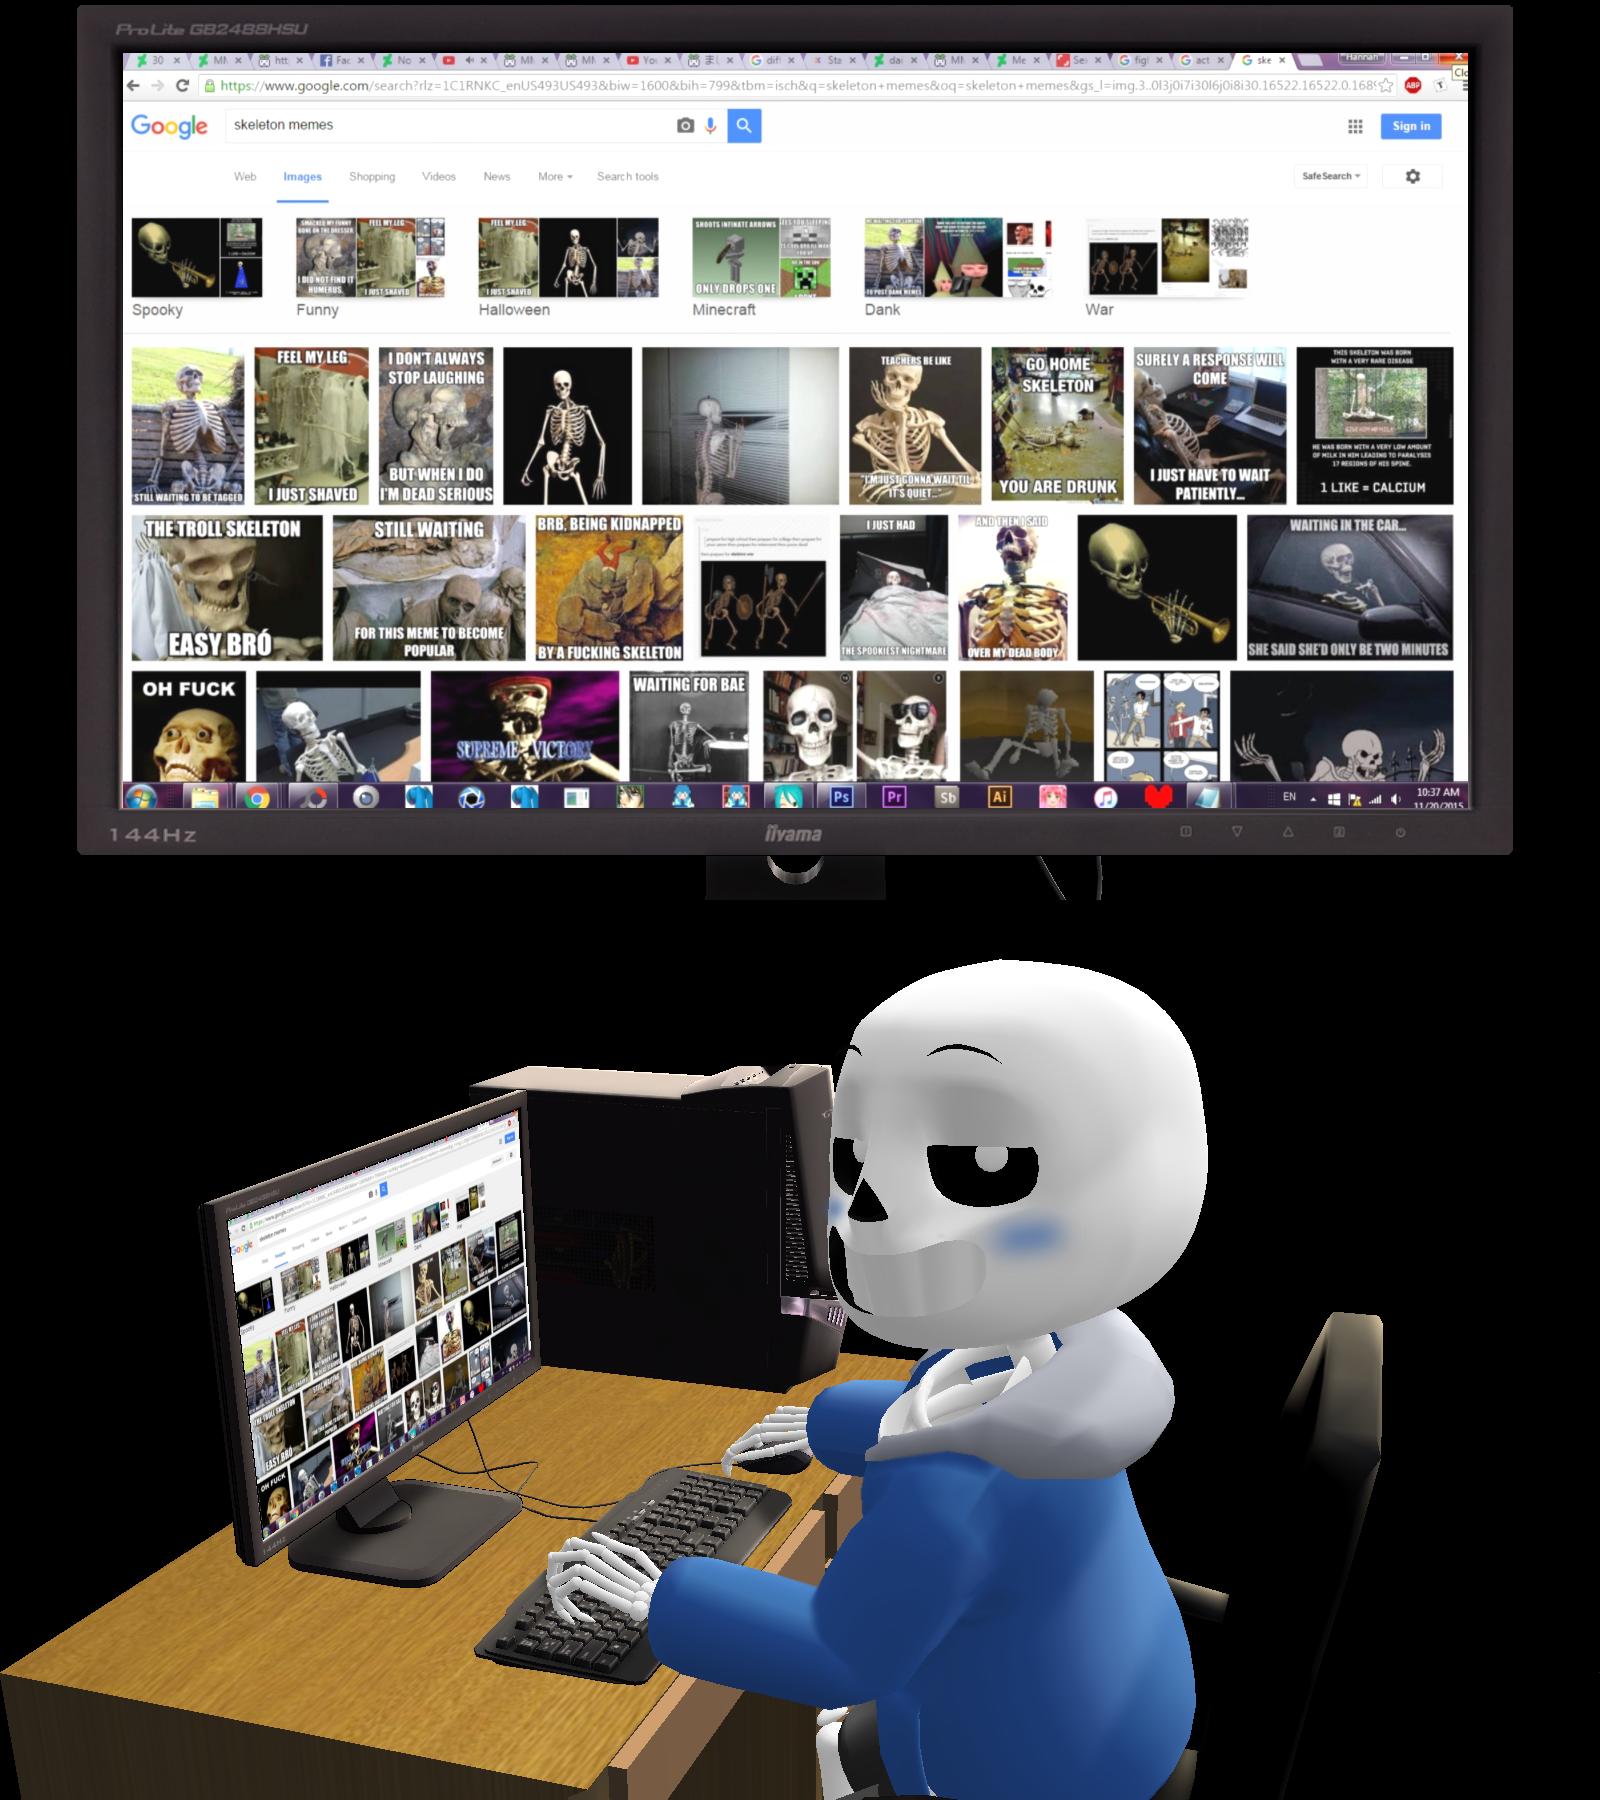 Mmd Skeleton Memes By Snorlaxin On Deviantart